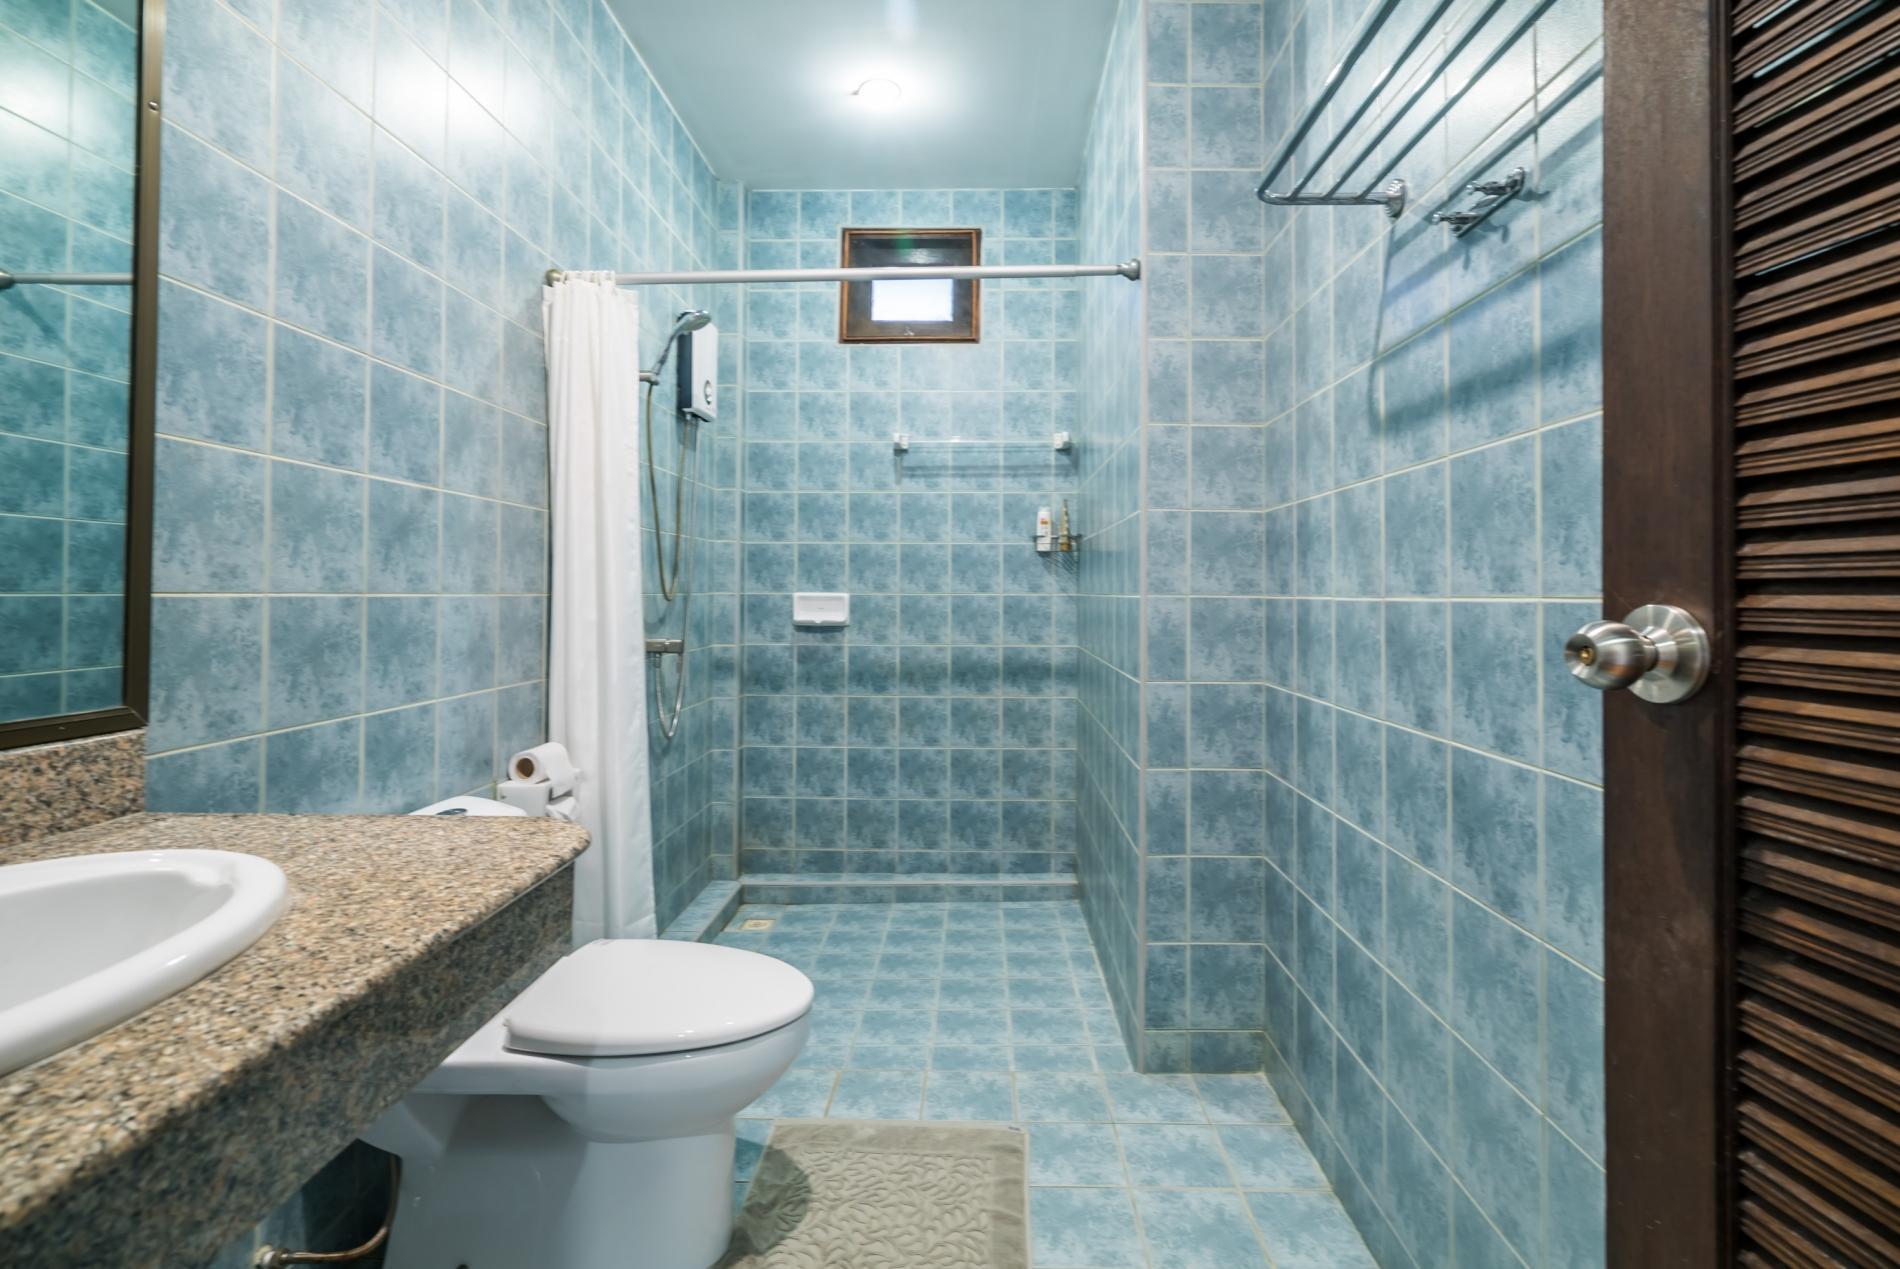 Pasak soi 3 - Convenient pool villa in quiet location, near Laguna, Boat avenue photo 5672238